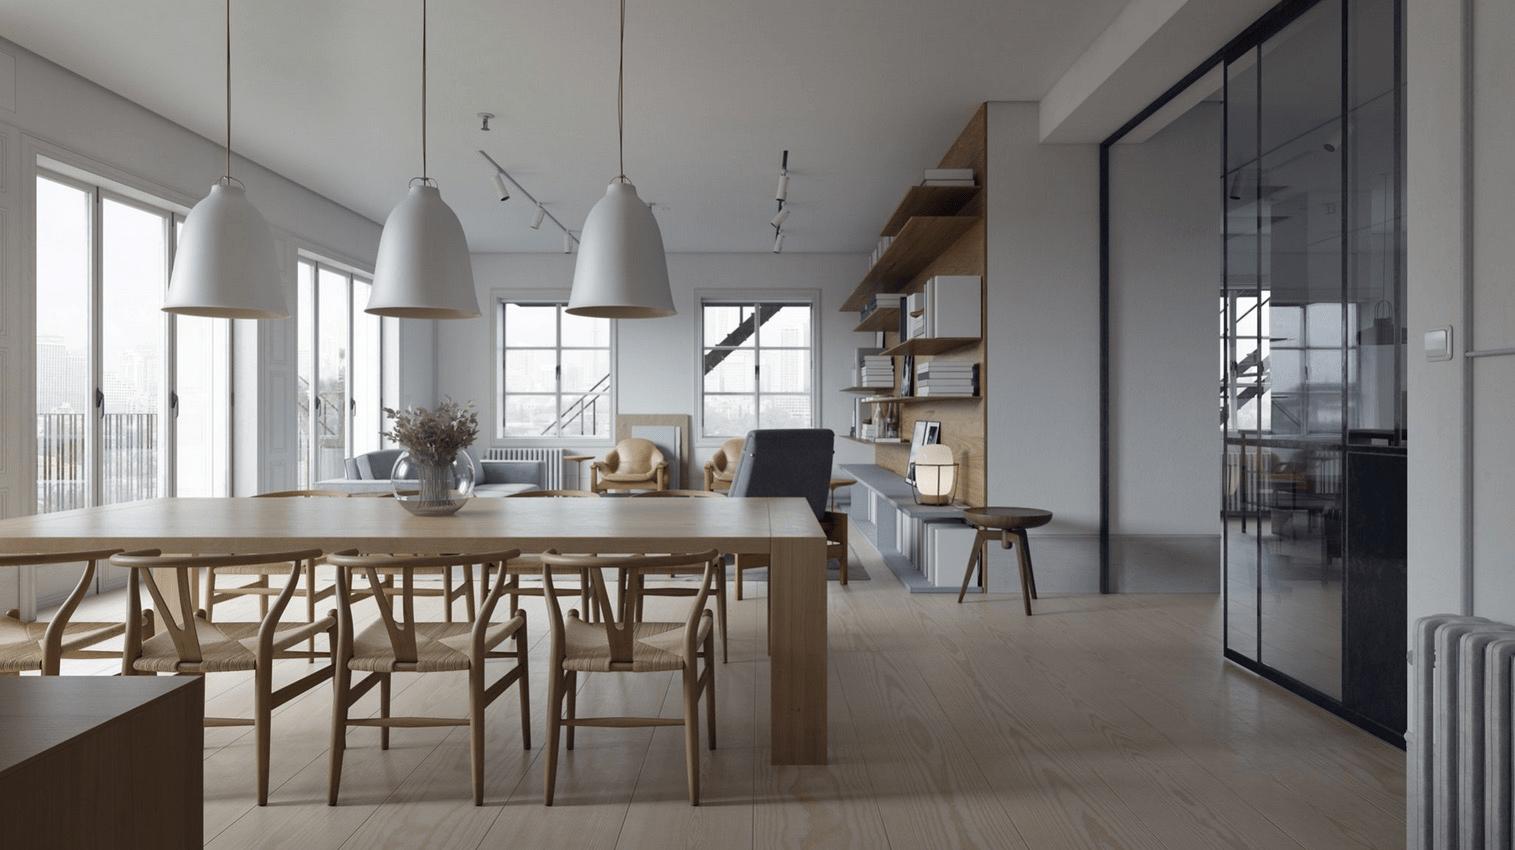 astounding dining room interior design ideas | open-plan-dining-room - D.Signers